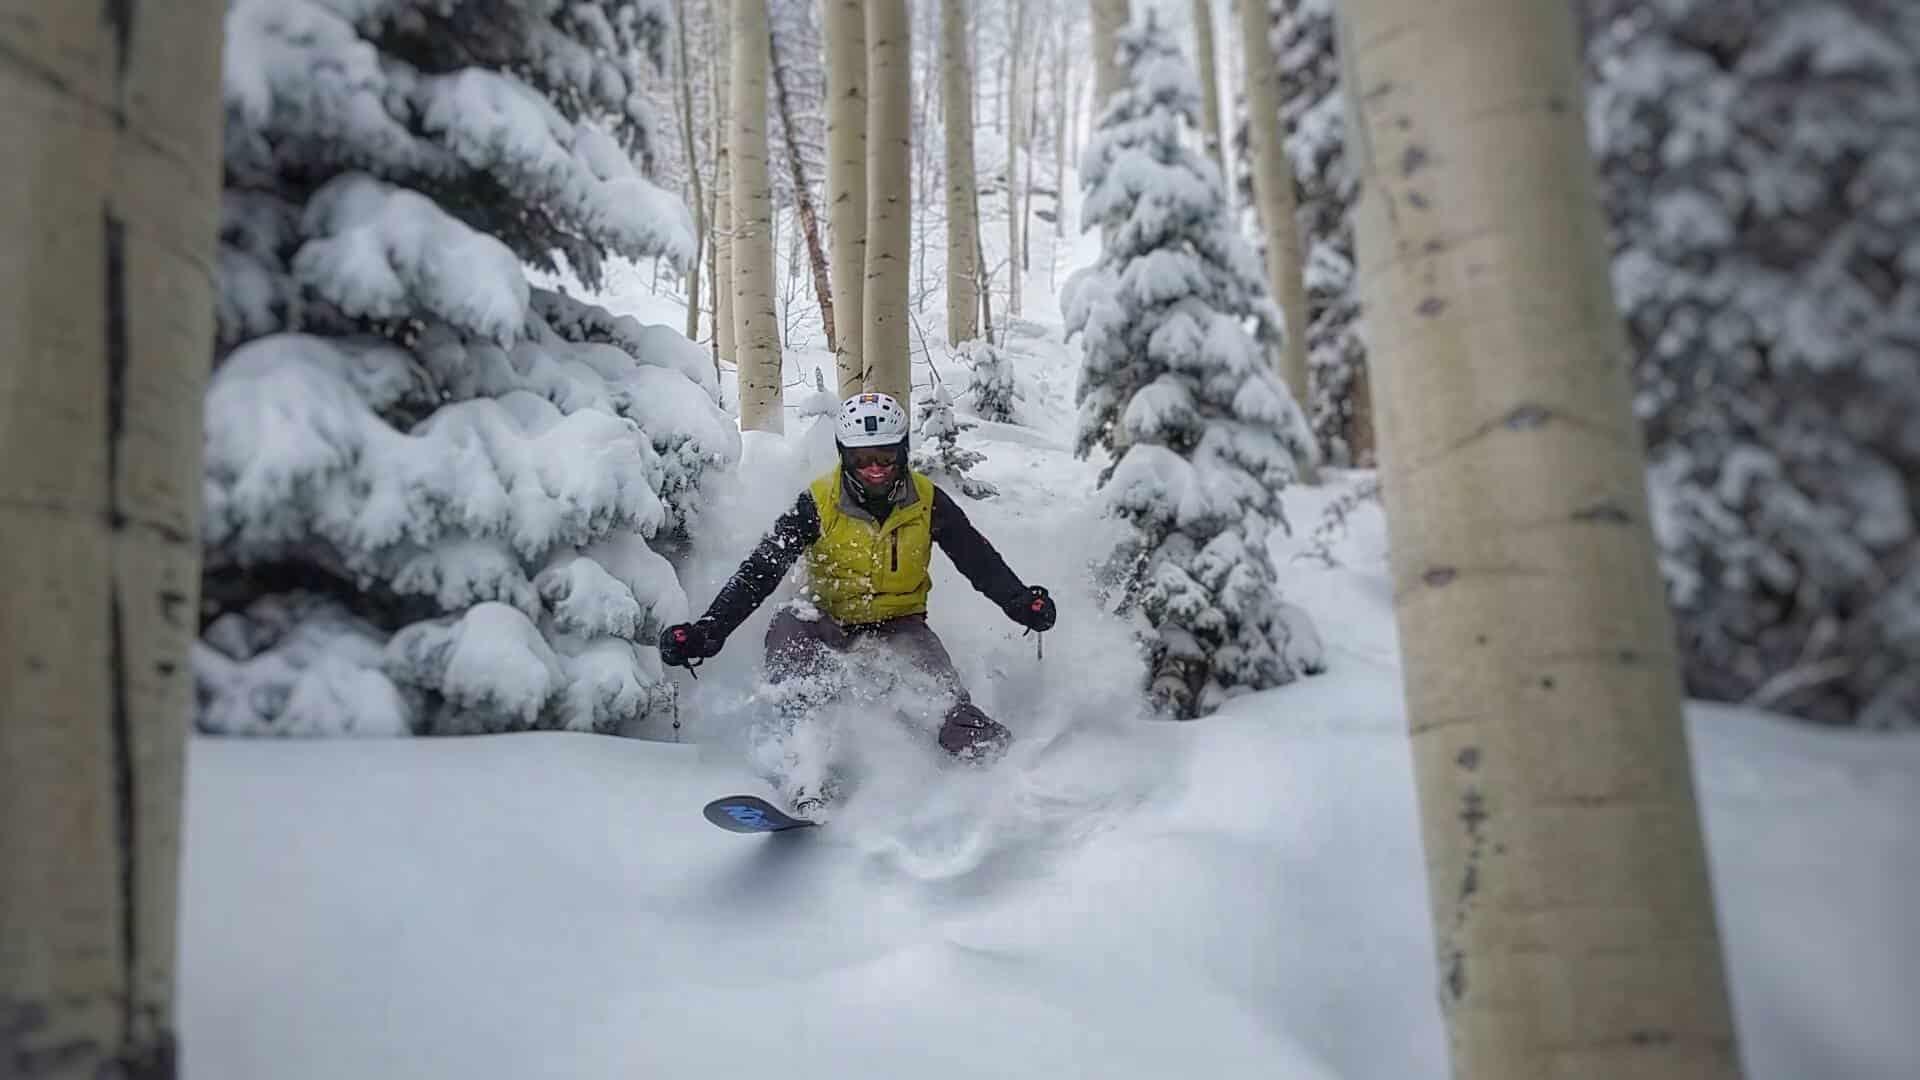 How to DIY Mount Snow Ski Bindings on Snow Skis at Home